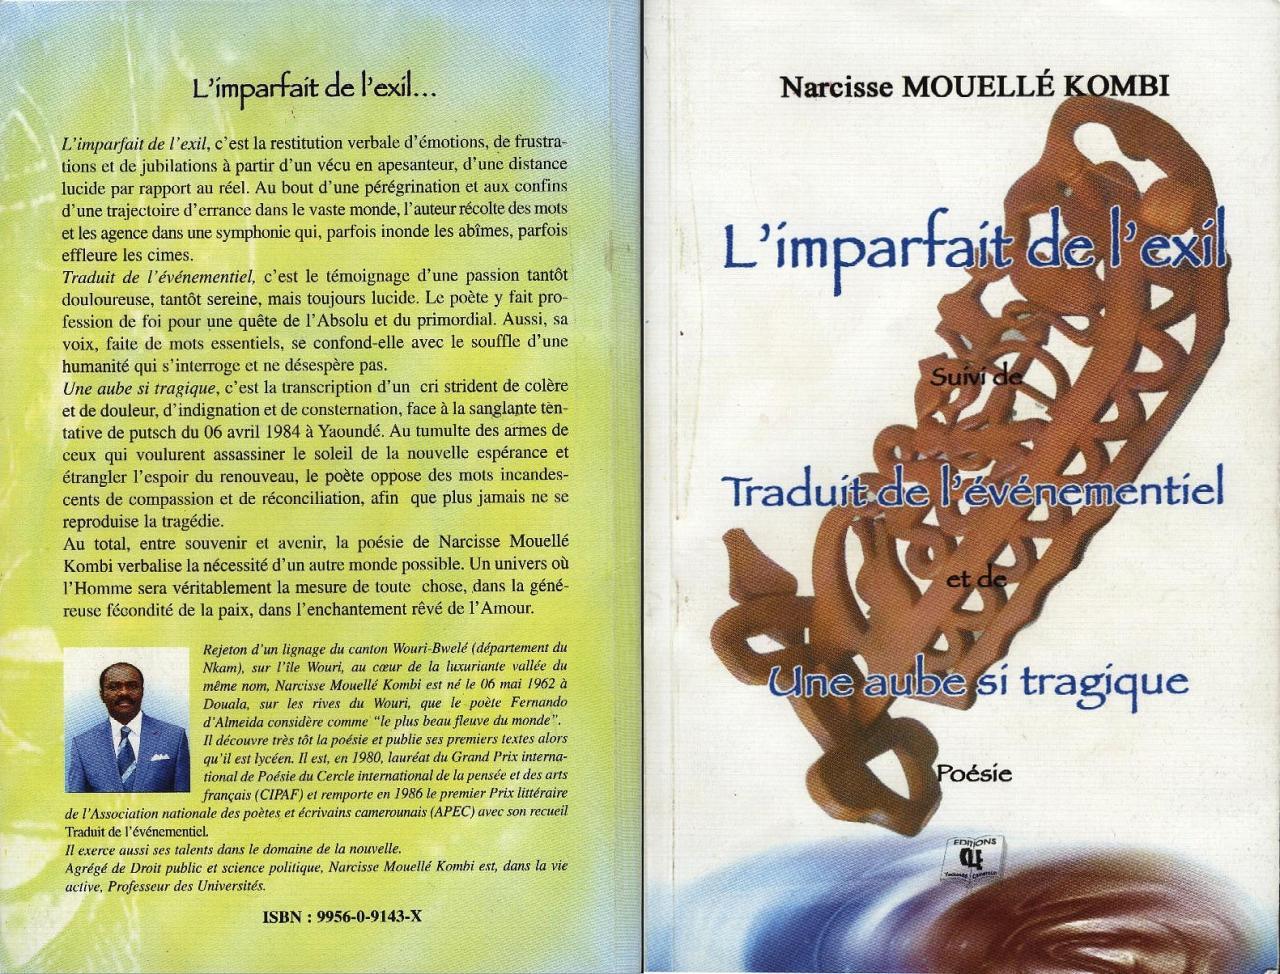 Narcisse Mouellé Kombi